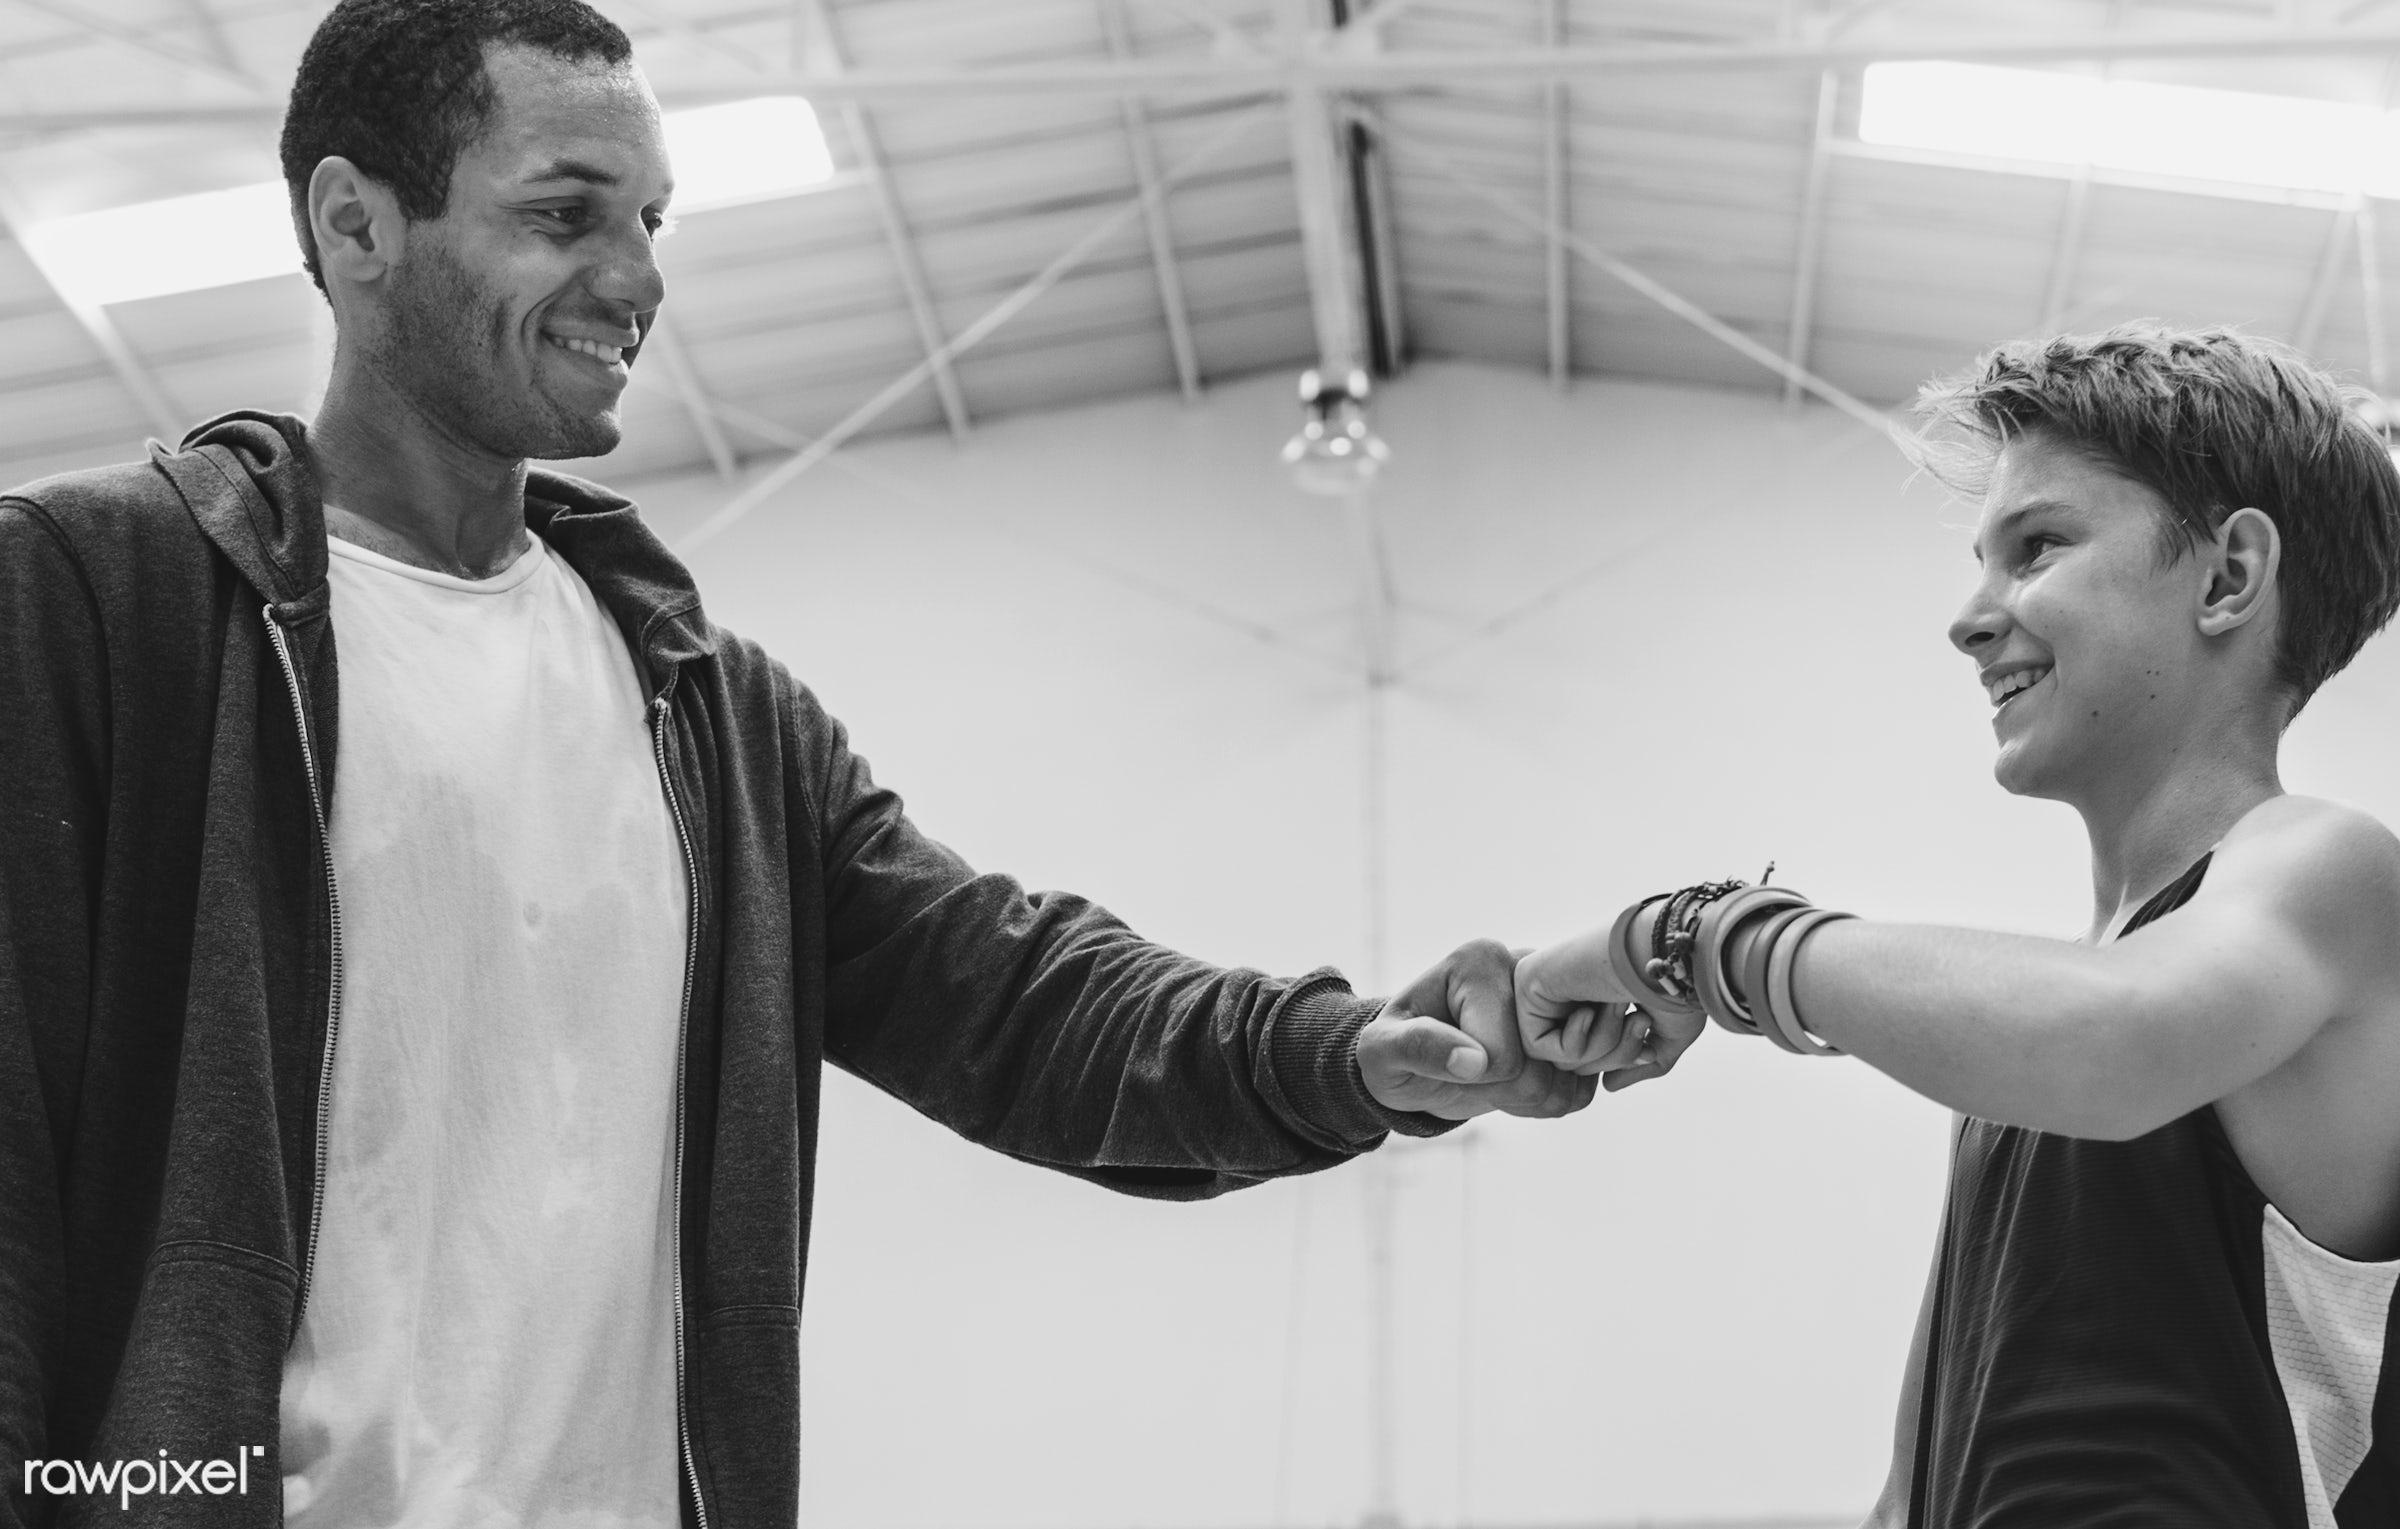 Young basketball player shoot - teach, teen, basketball, coach, coaching, play, support, activity, boy, court, exercise,...